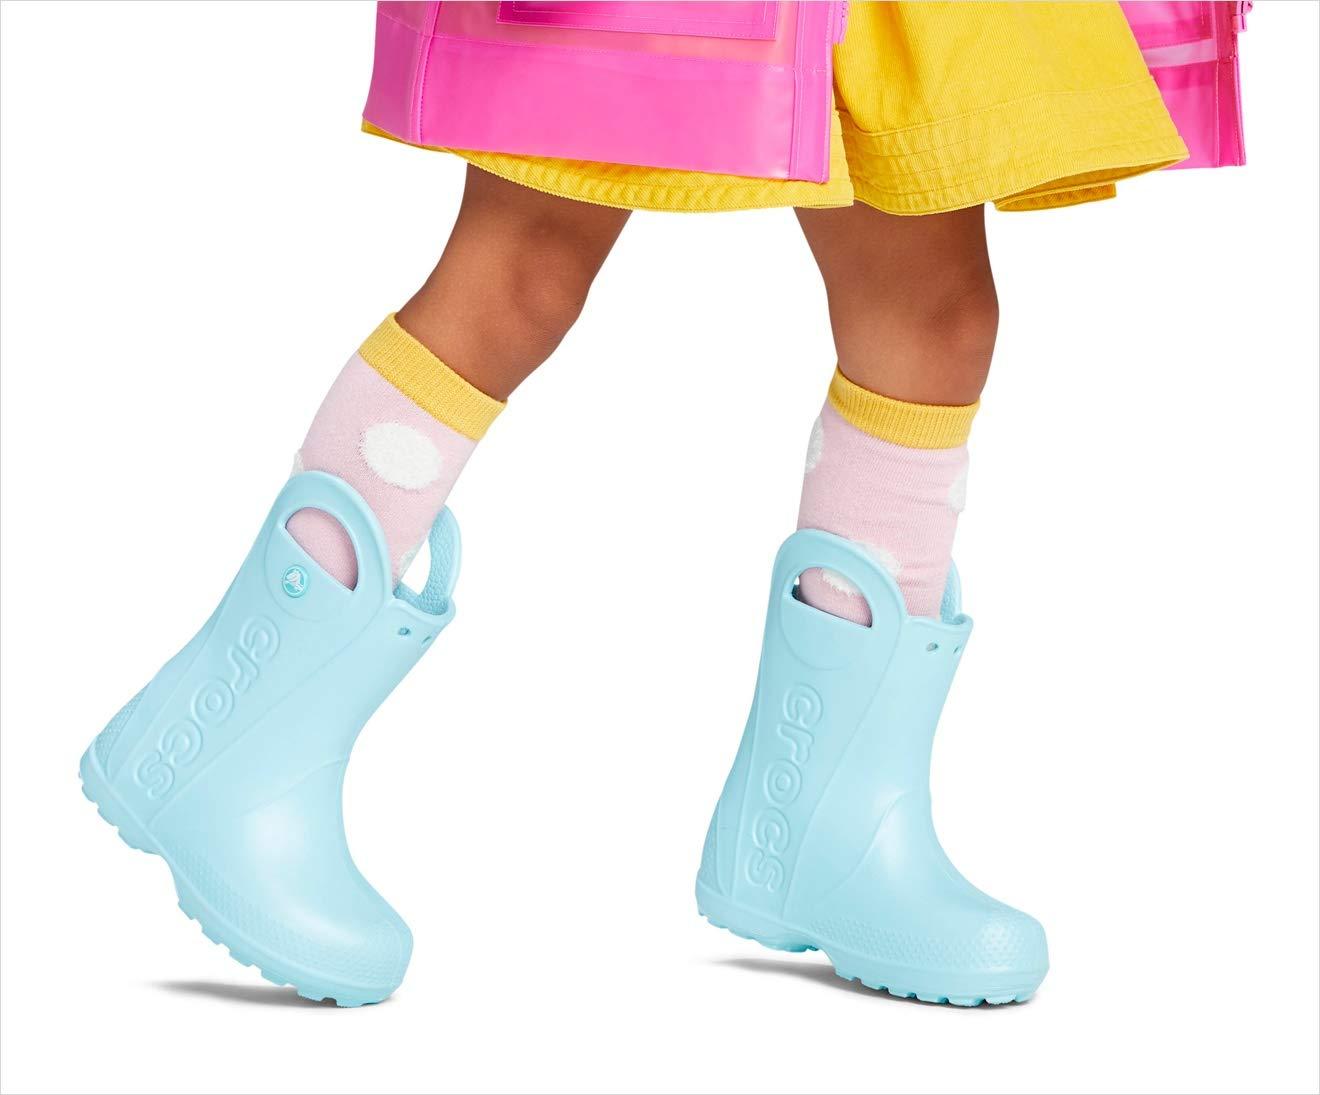 Crocs Kids' Handle It Rain Boot, Flame, 8 M US Toddler by Crocs (Image #6)